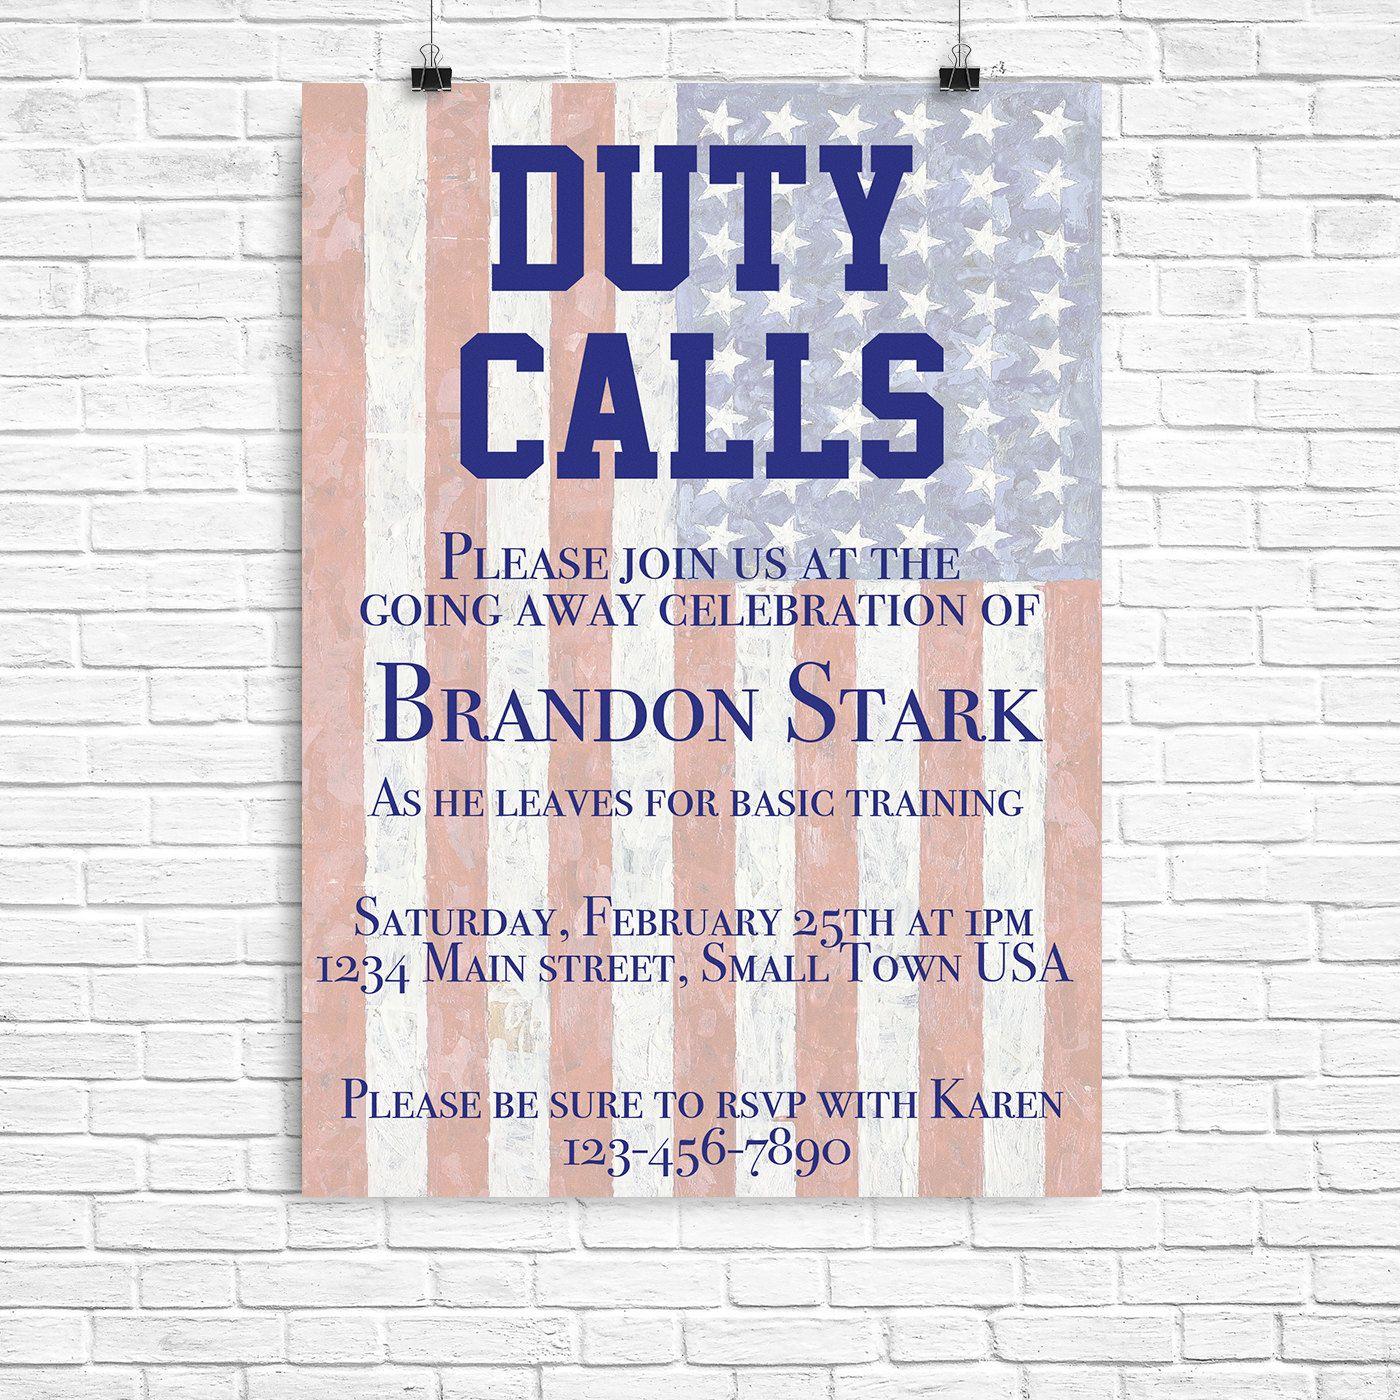 Duty calls invite Deployment party invitation – Military Party Invitations